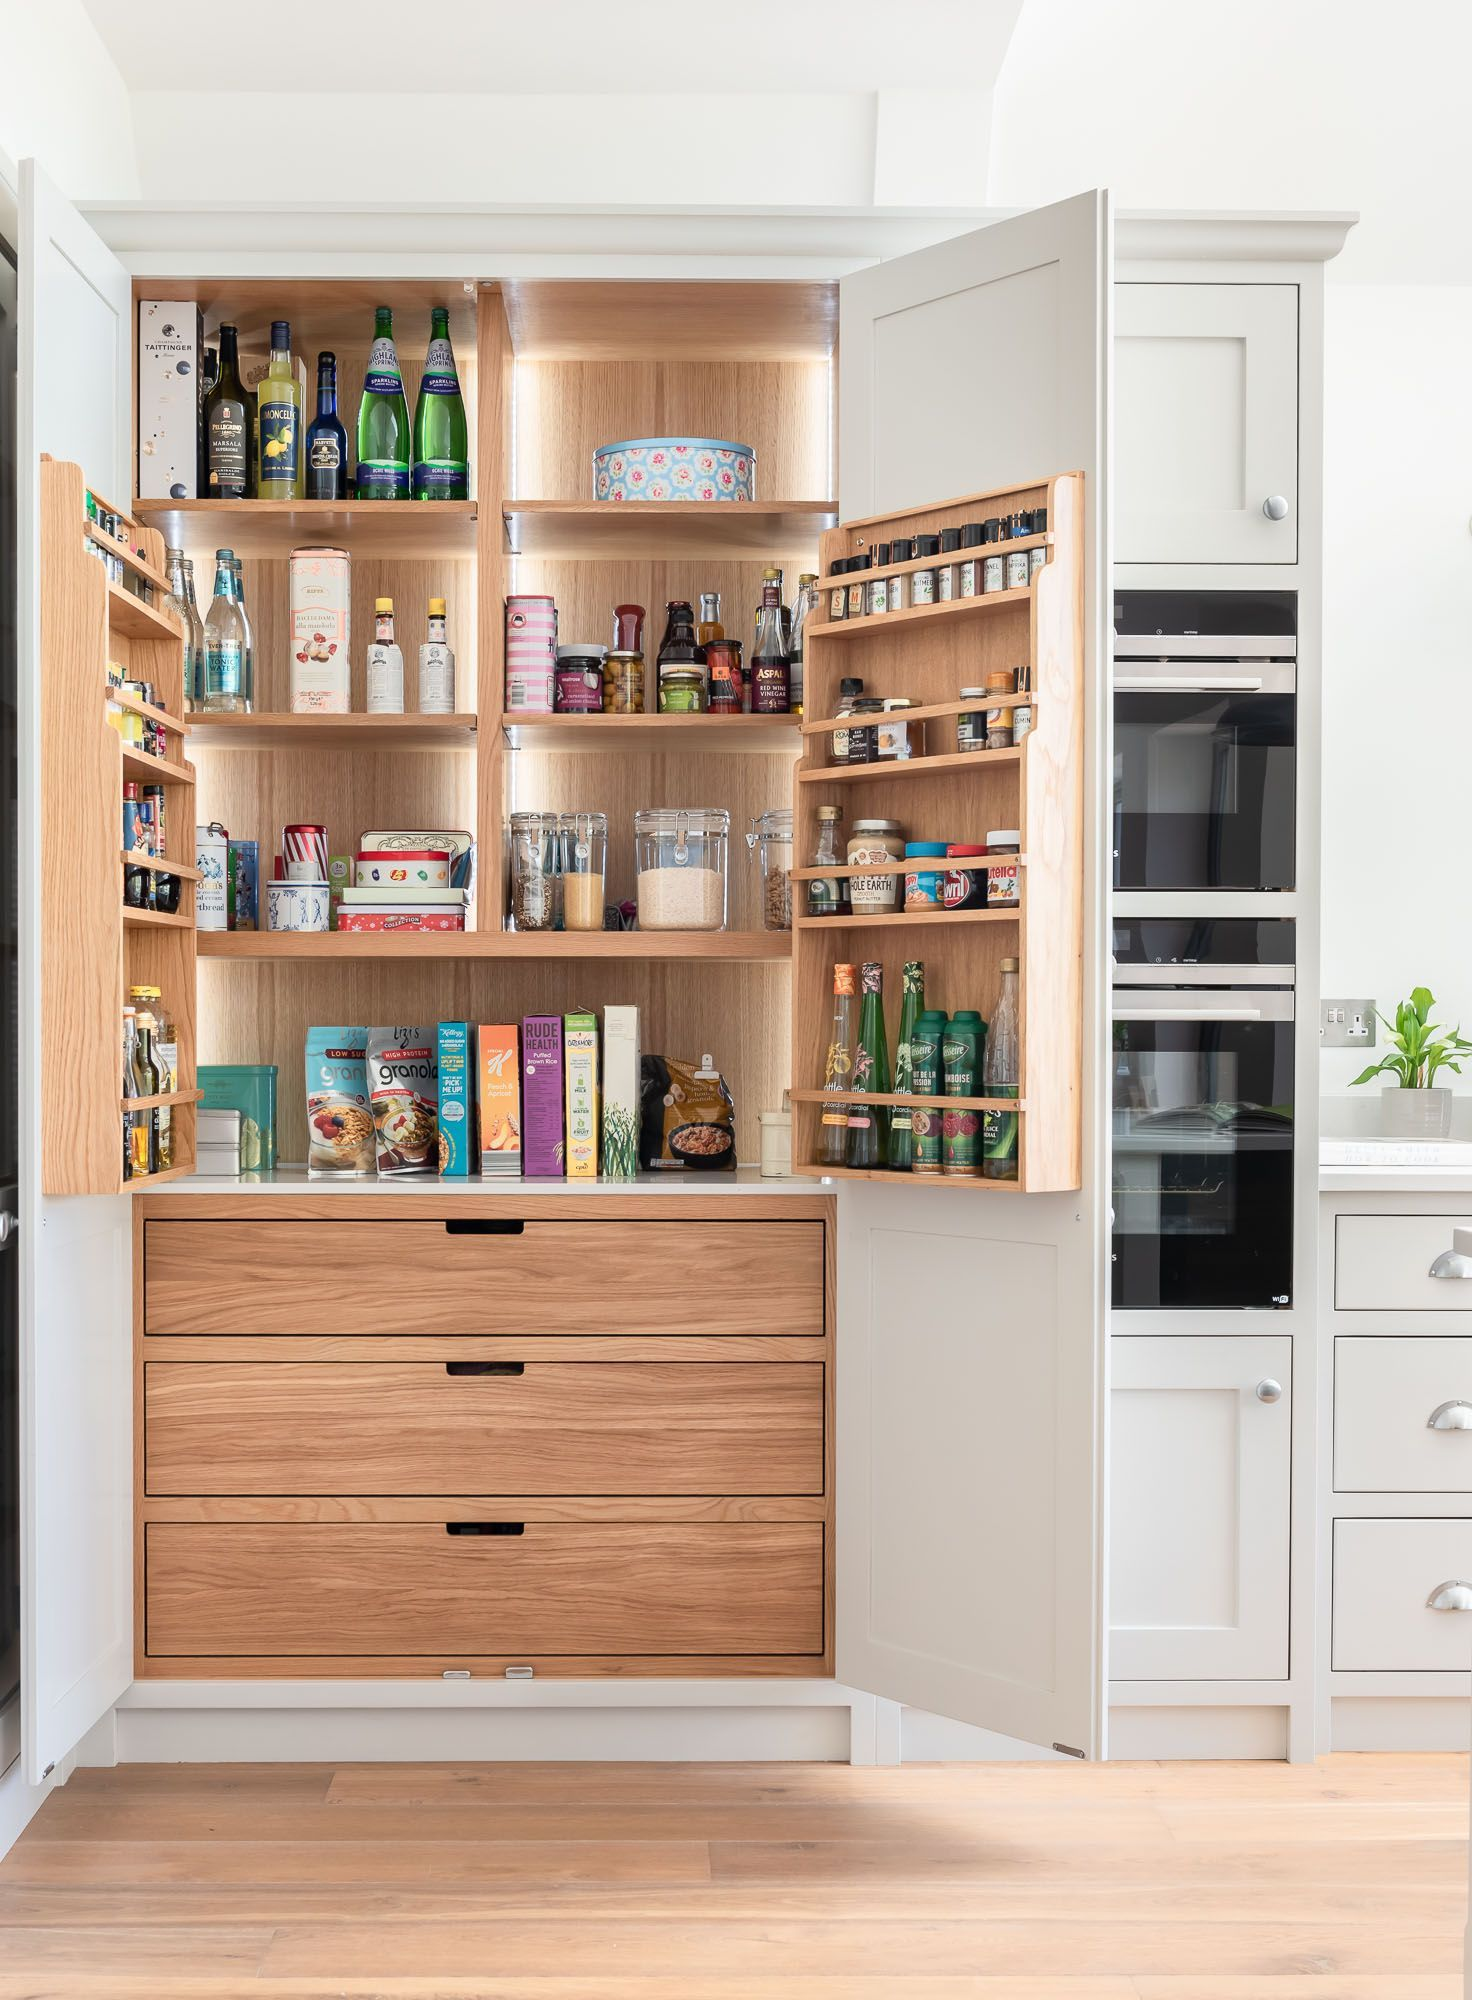 Oak Pantry Cupboard Kitchen Remodel Small White Wood Kitchens Kitchen Design